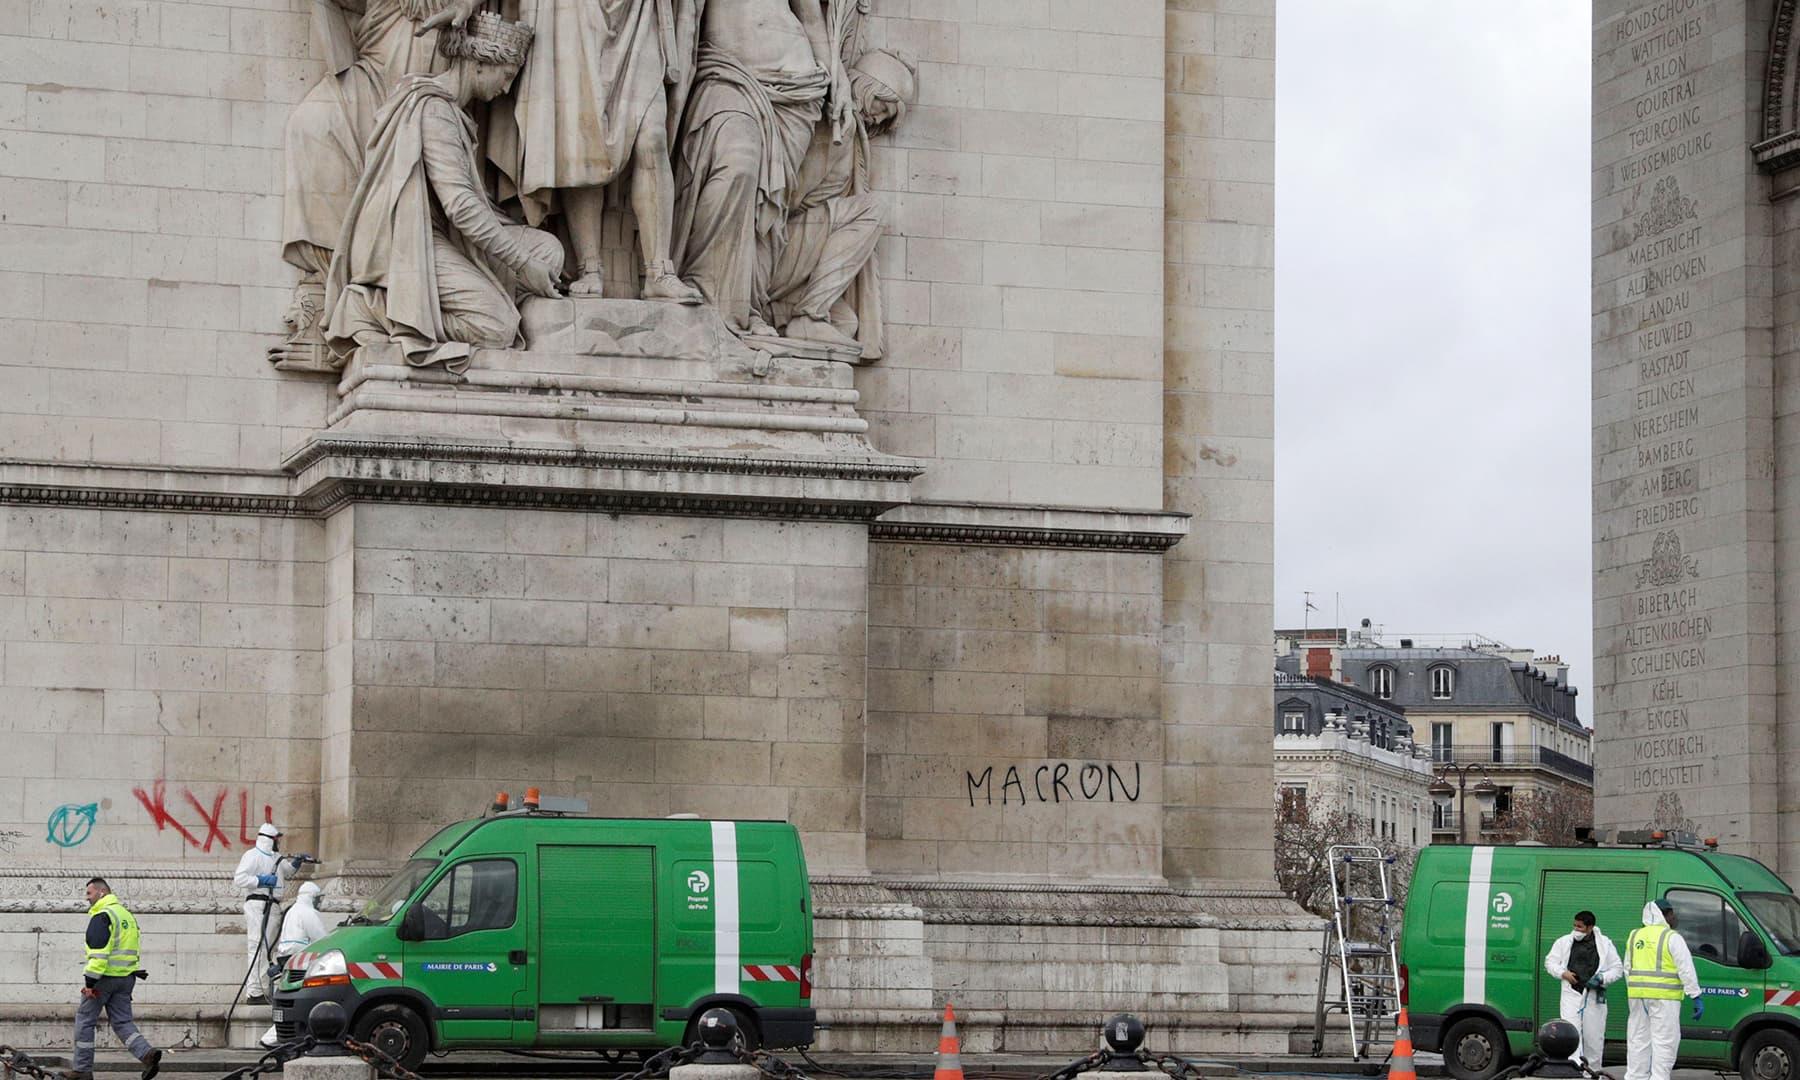 Workers scrub clean the graffiti littered Arc de Triomphe in Paris. —AFP